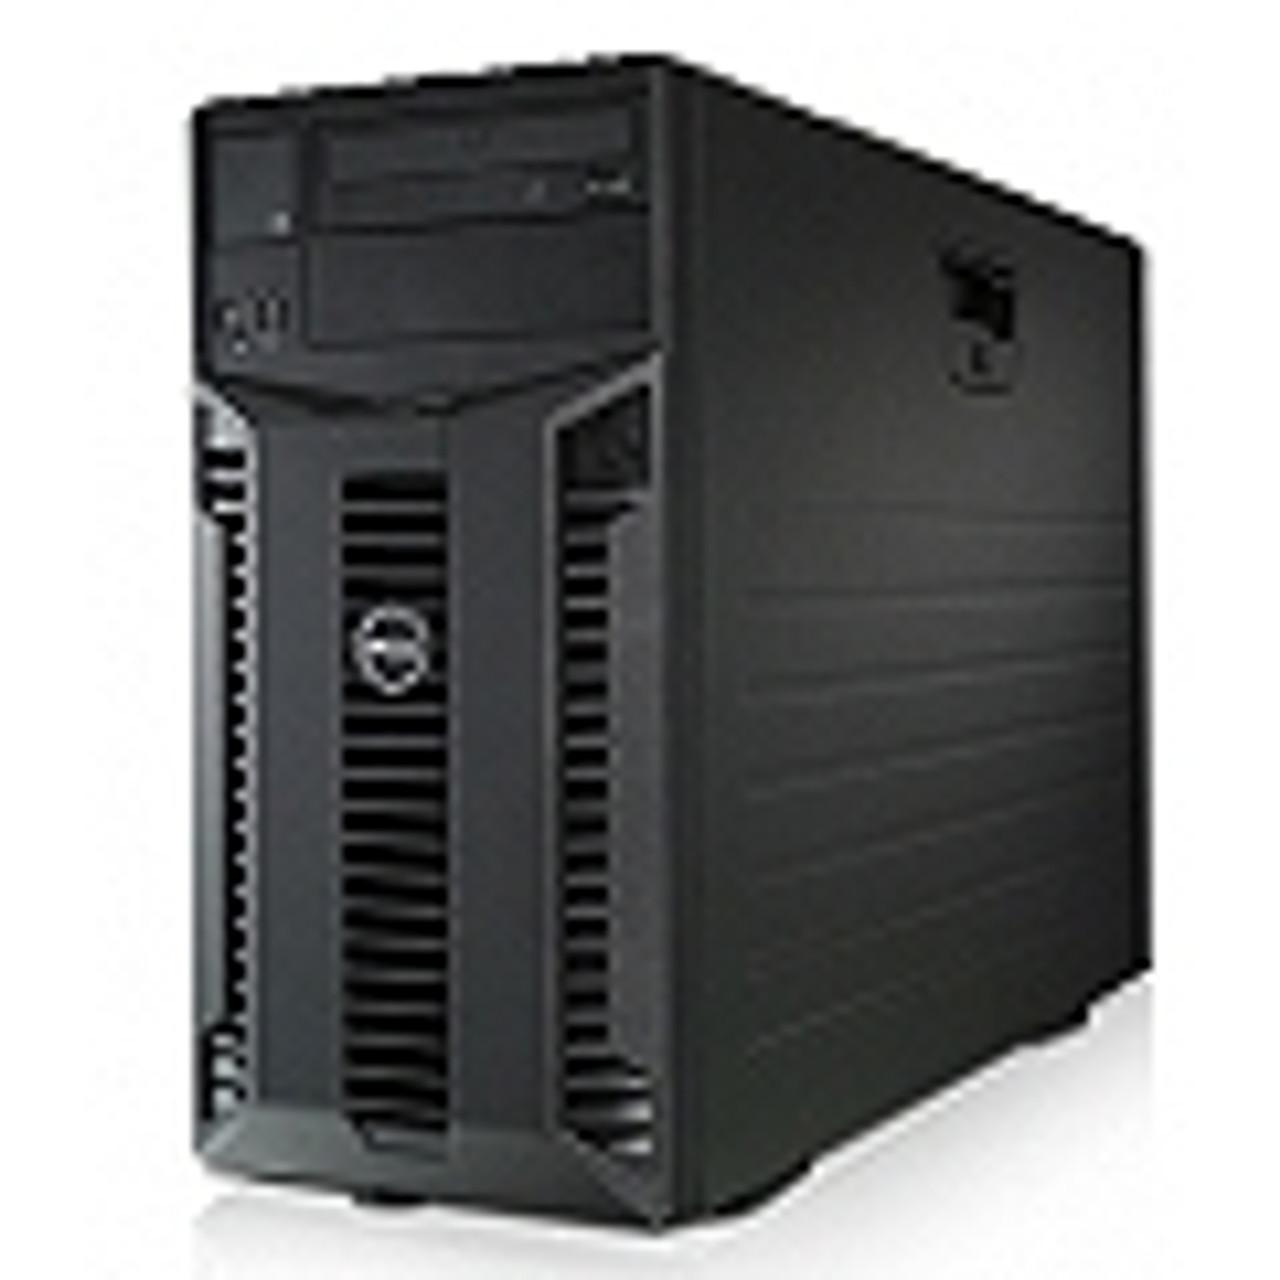 Dell PowerEdge T410 Servers